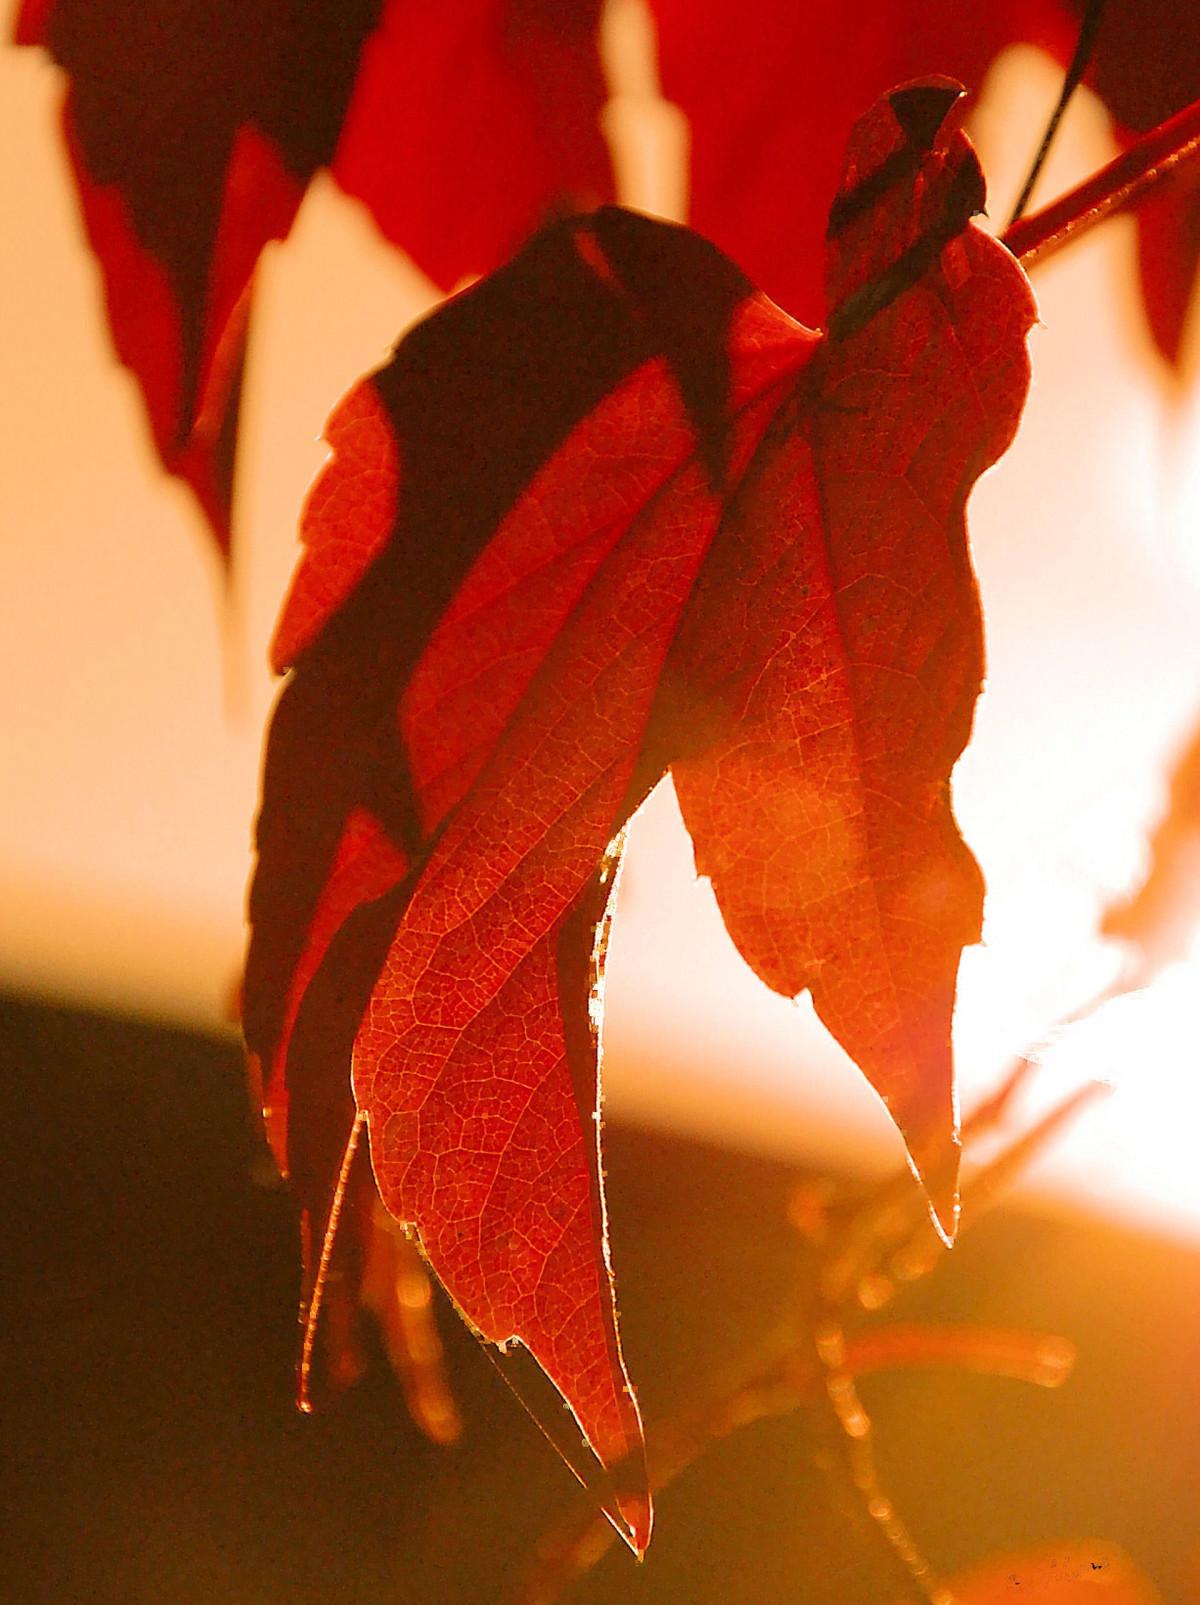 kostenlose foto baum ast pflanze blatt blume bl tenblatt rot farbe herbst flora. Black Bedroom Furniture Sets. Home Design Ideas